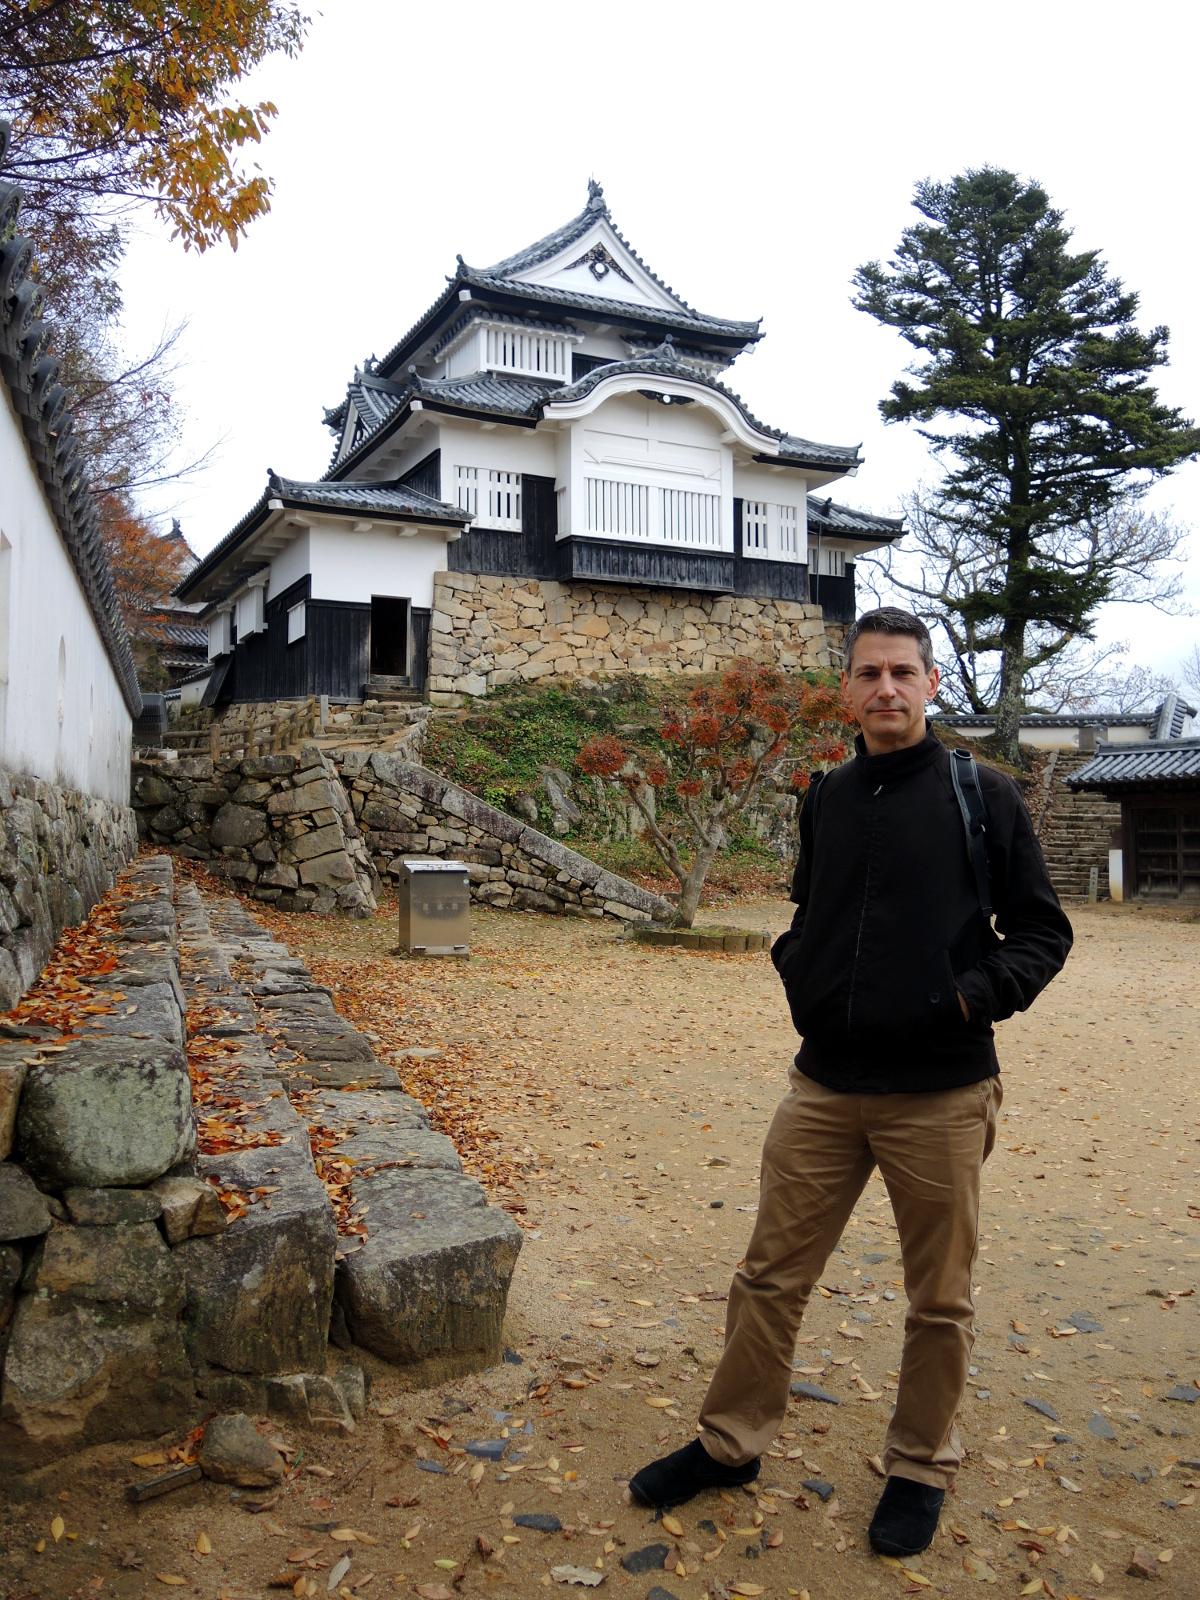 Bitchu Matsuyama Castle, Takahashi The Real Japan Rob Dyer